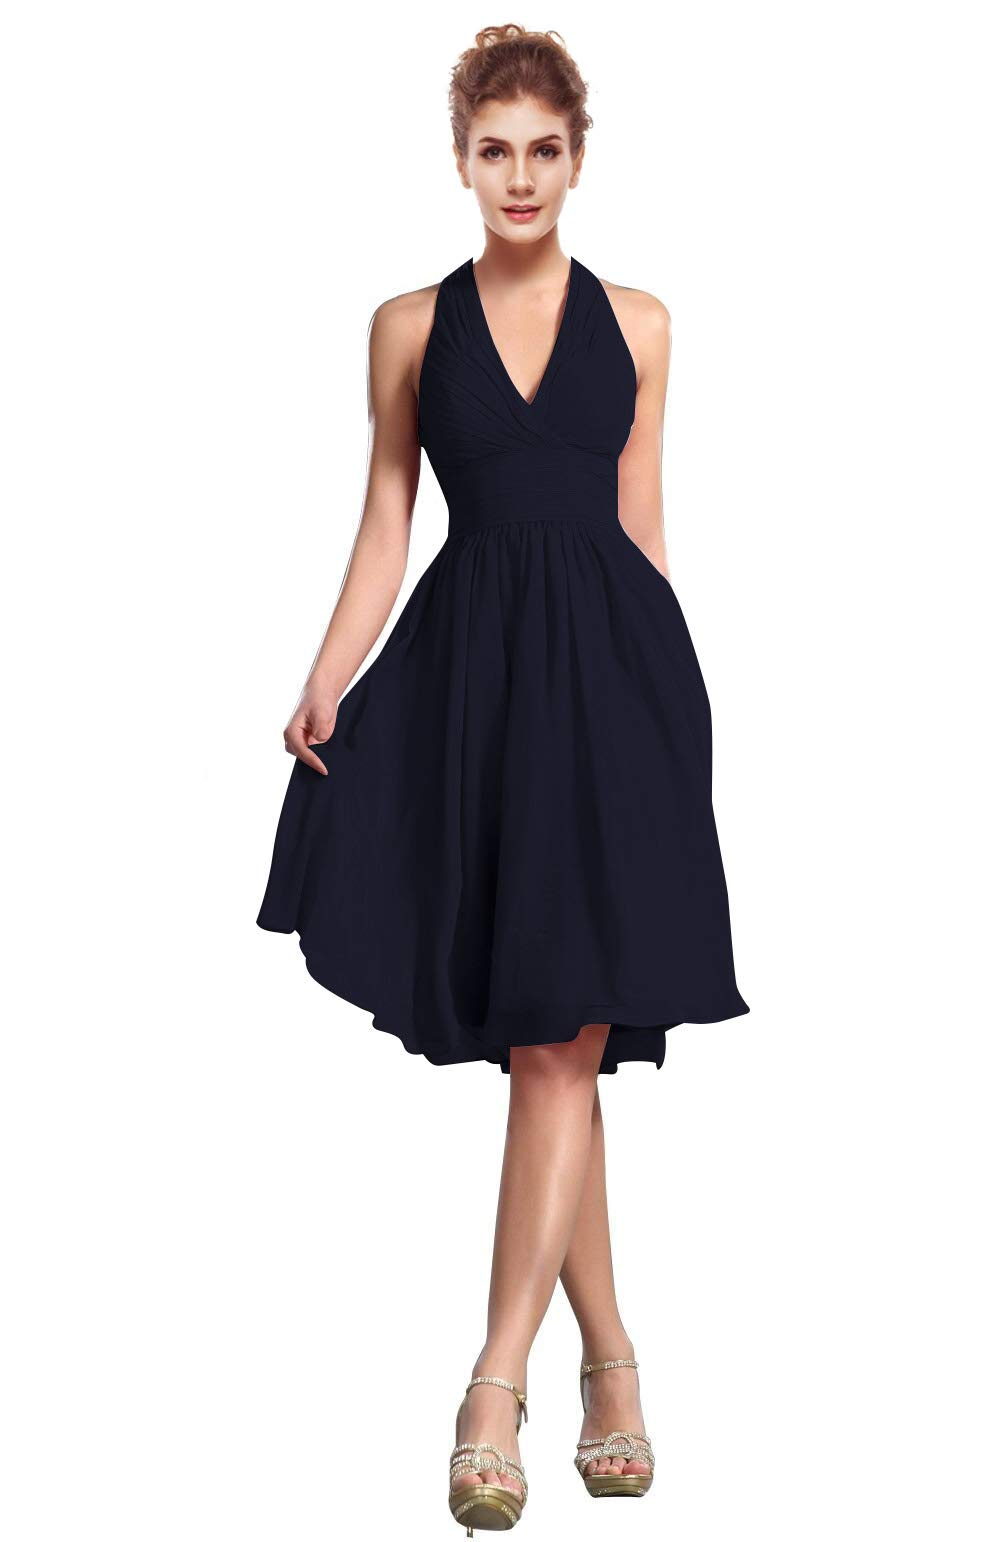 CaliaDress Women Elegant Halter Neck Bridesmaid Dress Formal Prom Gowns Short C200LF Navy Blue US2